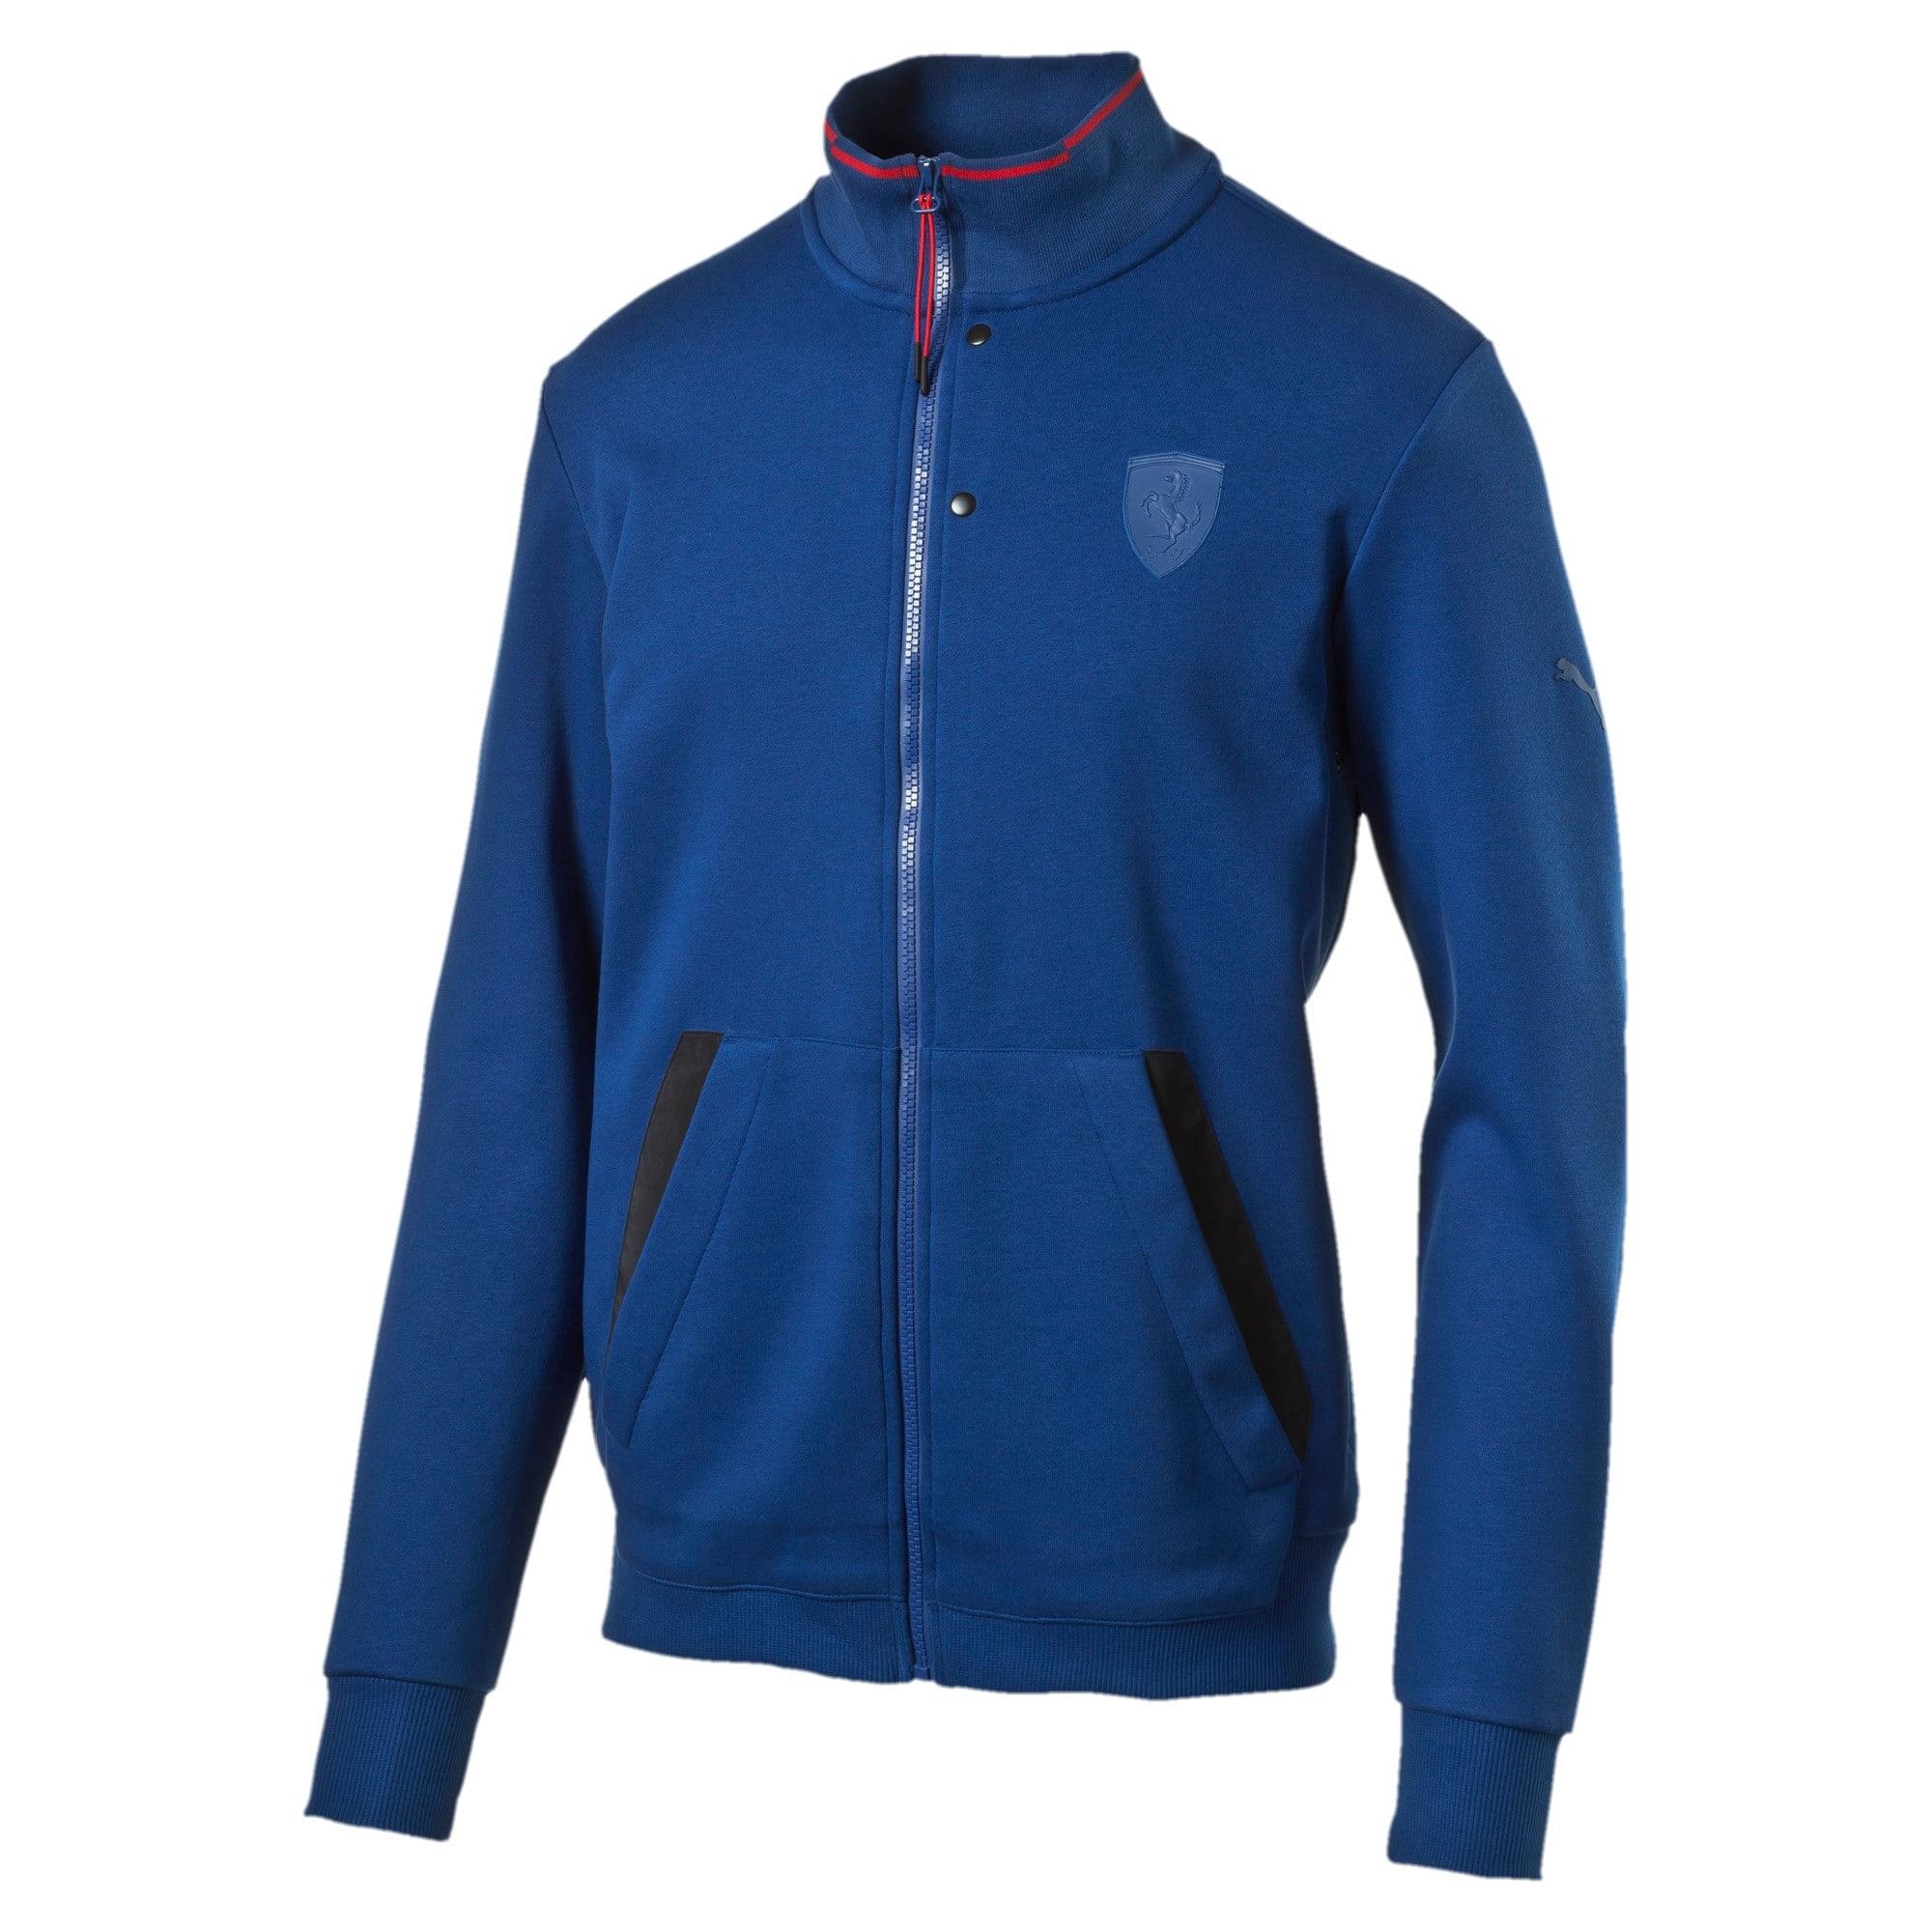 Thumbnail 1 of Ferrari Men's Sweat Jacket, Limoges, medium-IND